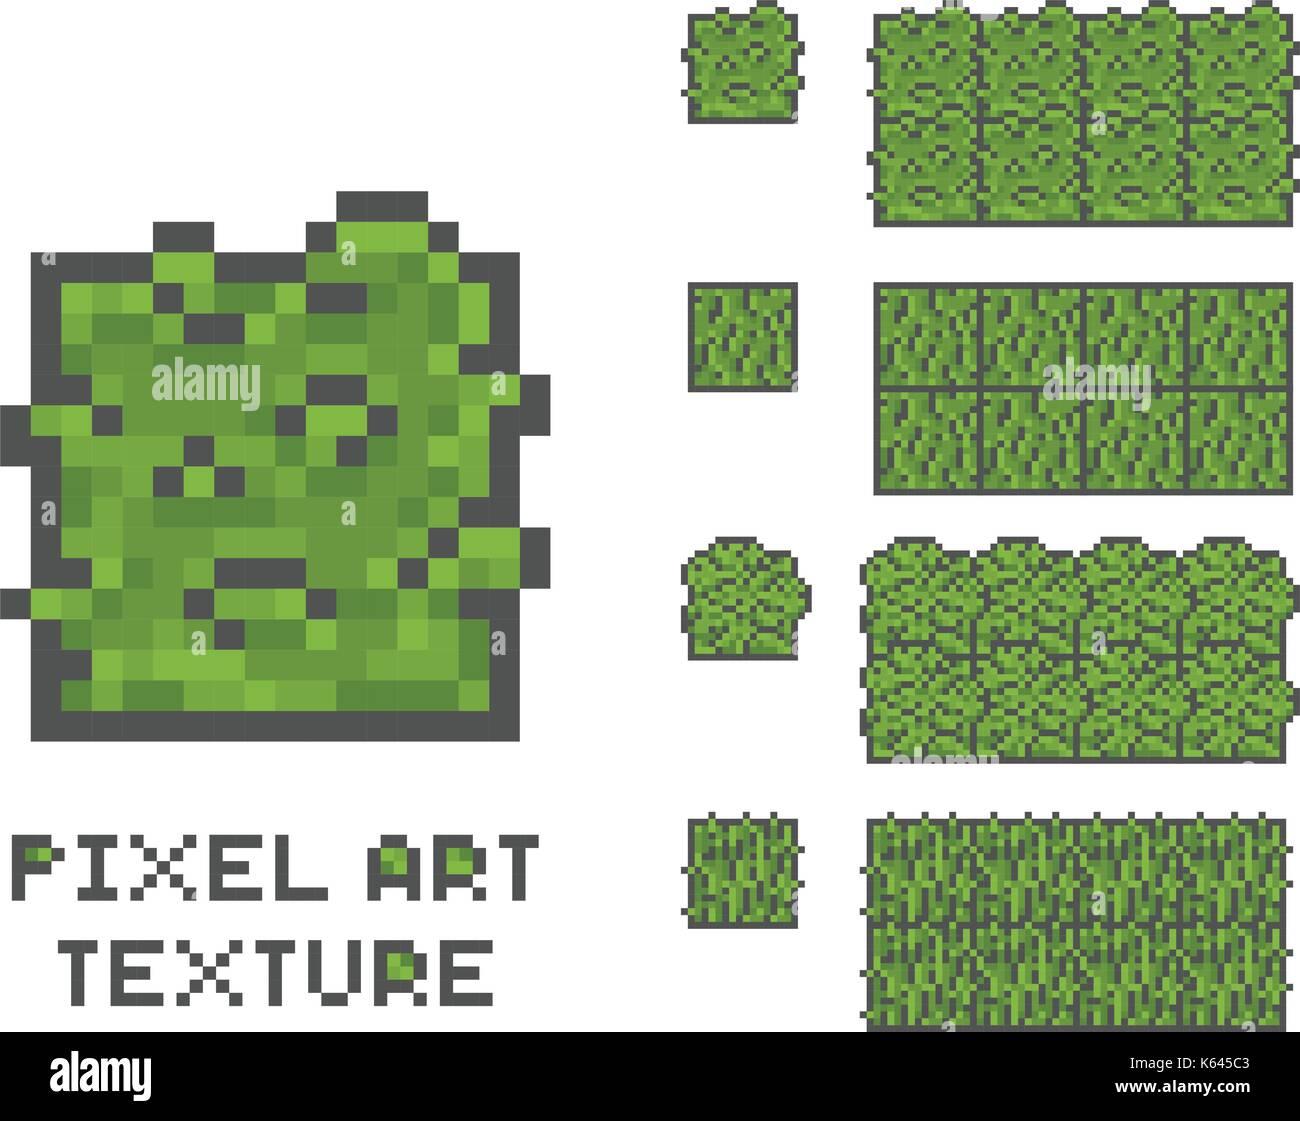 Grass Texture Game Inside Pixel Art Bit Game Sprite Illustration Green Grass Tree Pixelated Pattern Seamless Texture Background